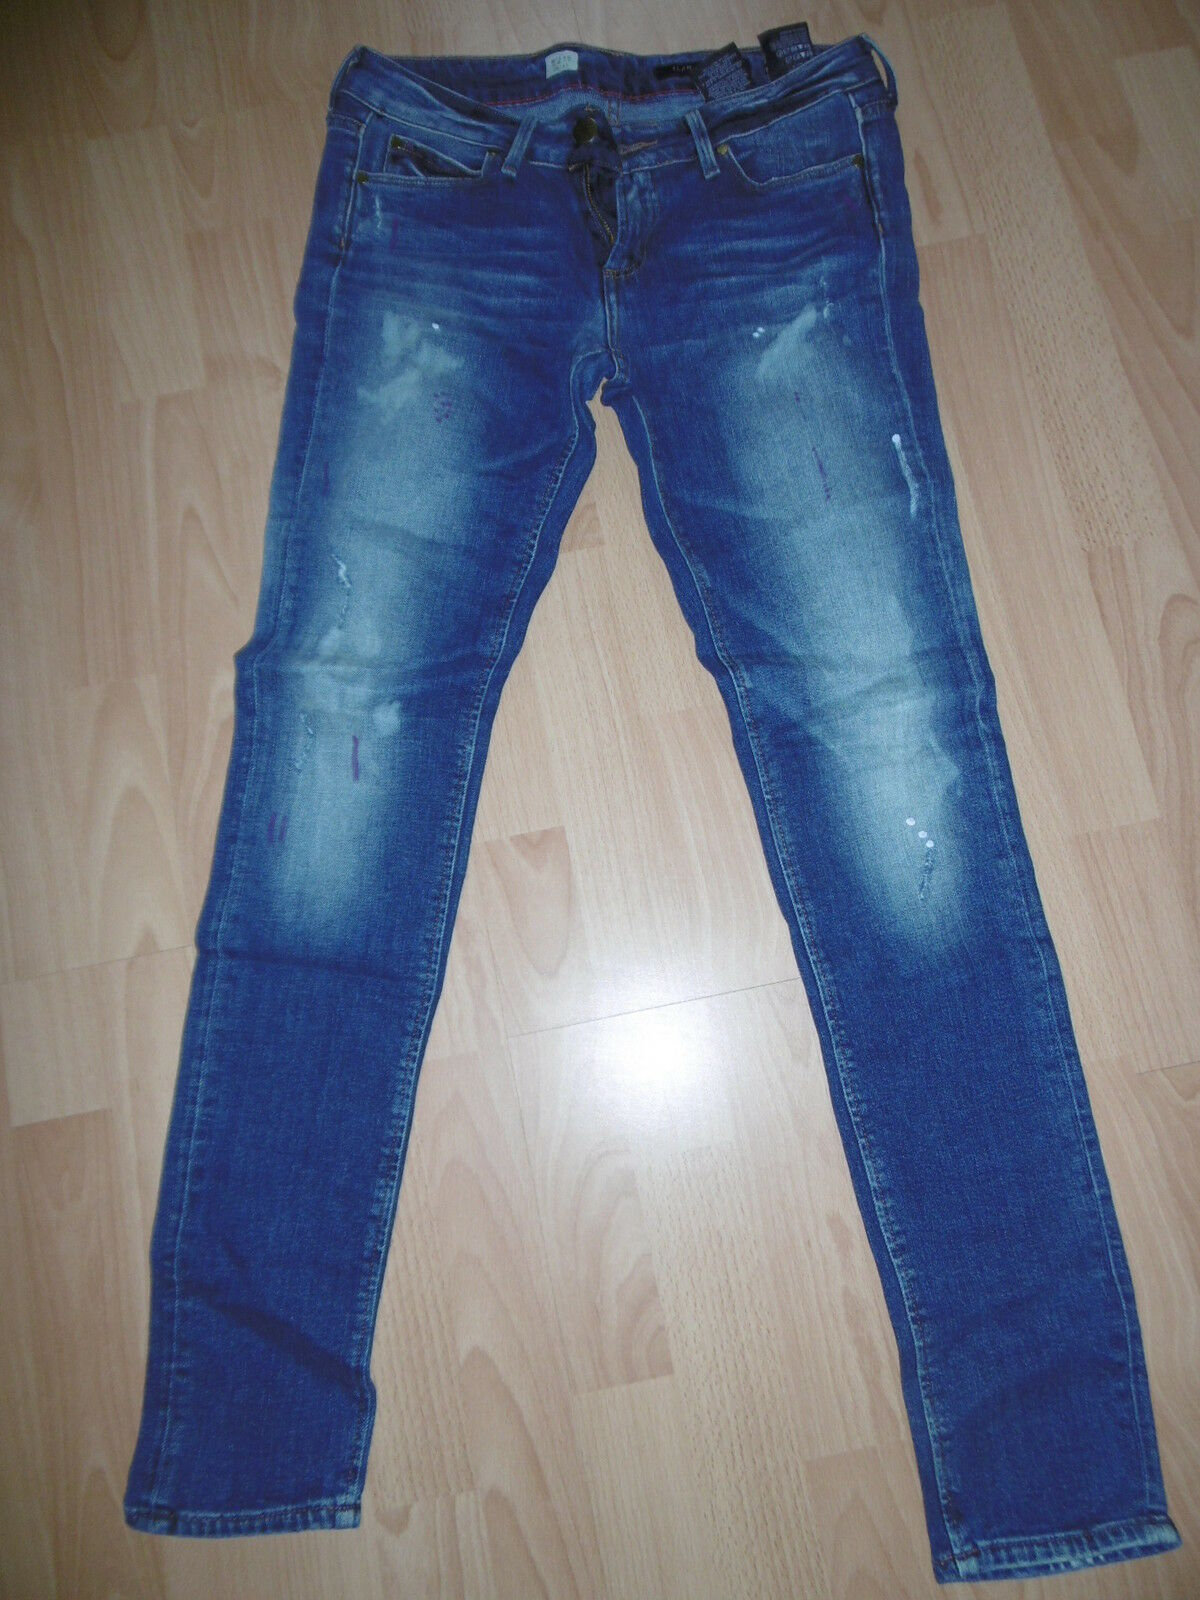 Super sexy Top Jeans Hose blau Tommy Hilfiger Milan 28 32 NEUw Slim Fit Denim